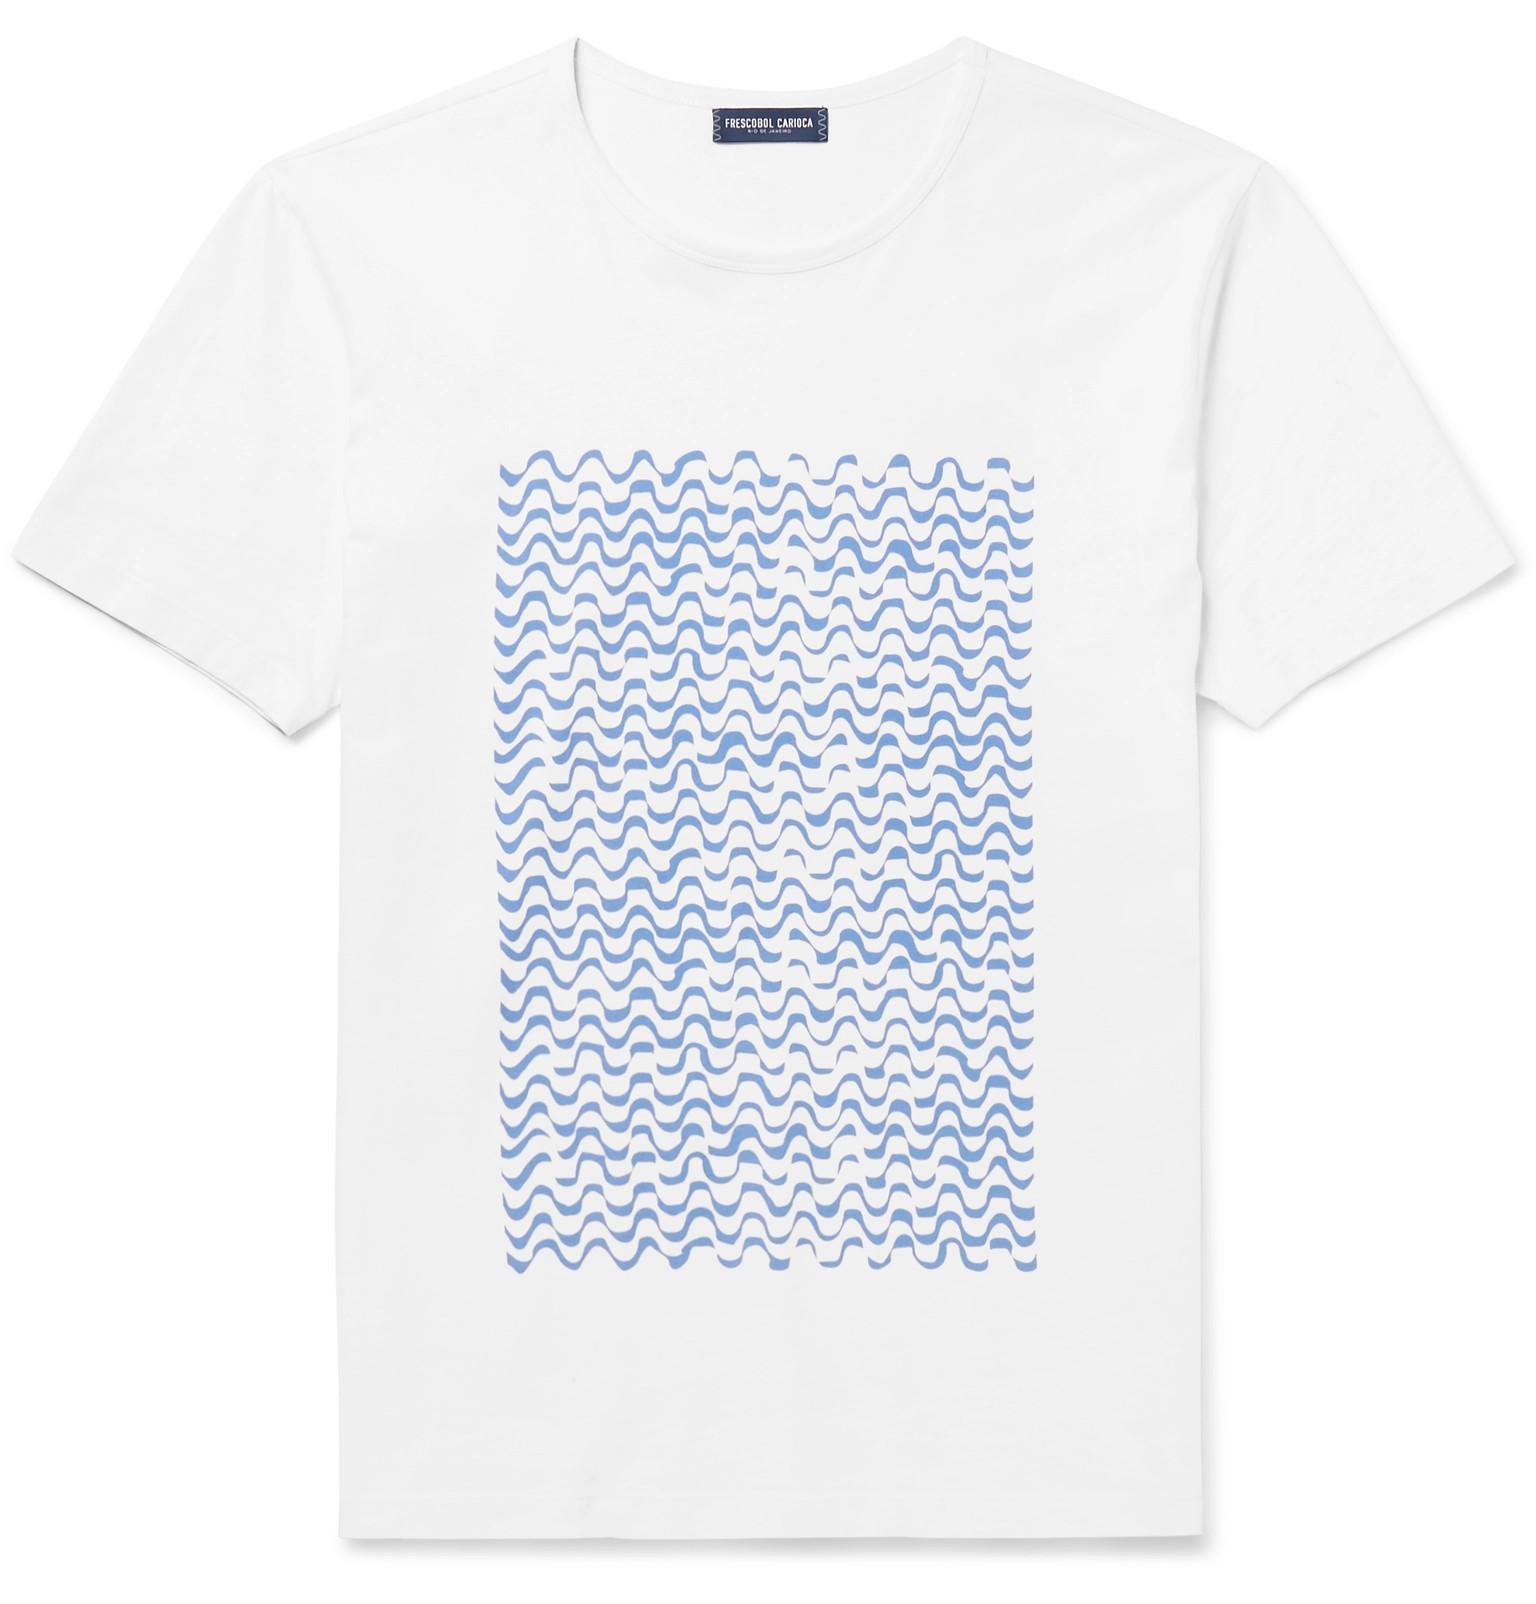 Frescobol Carioca + Paulo Mariotti Ipanema Printed Cotton-jersey T-shirt - White V7eoKV7